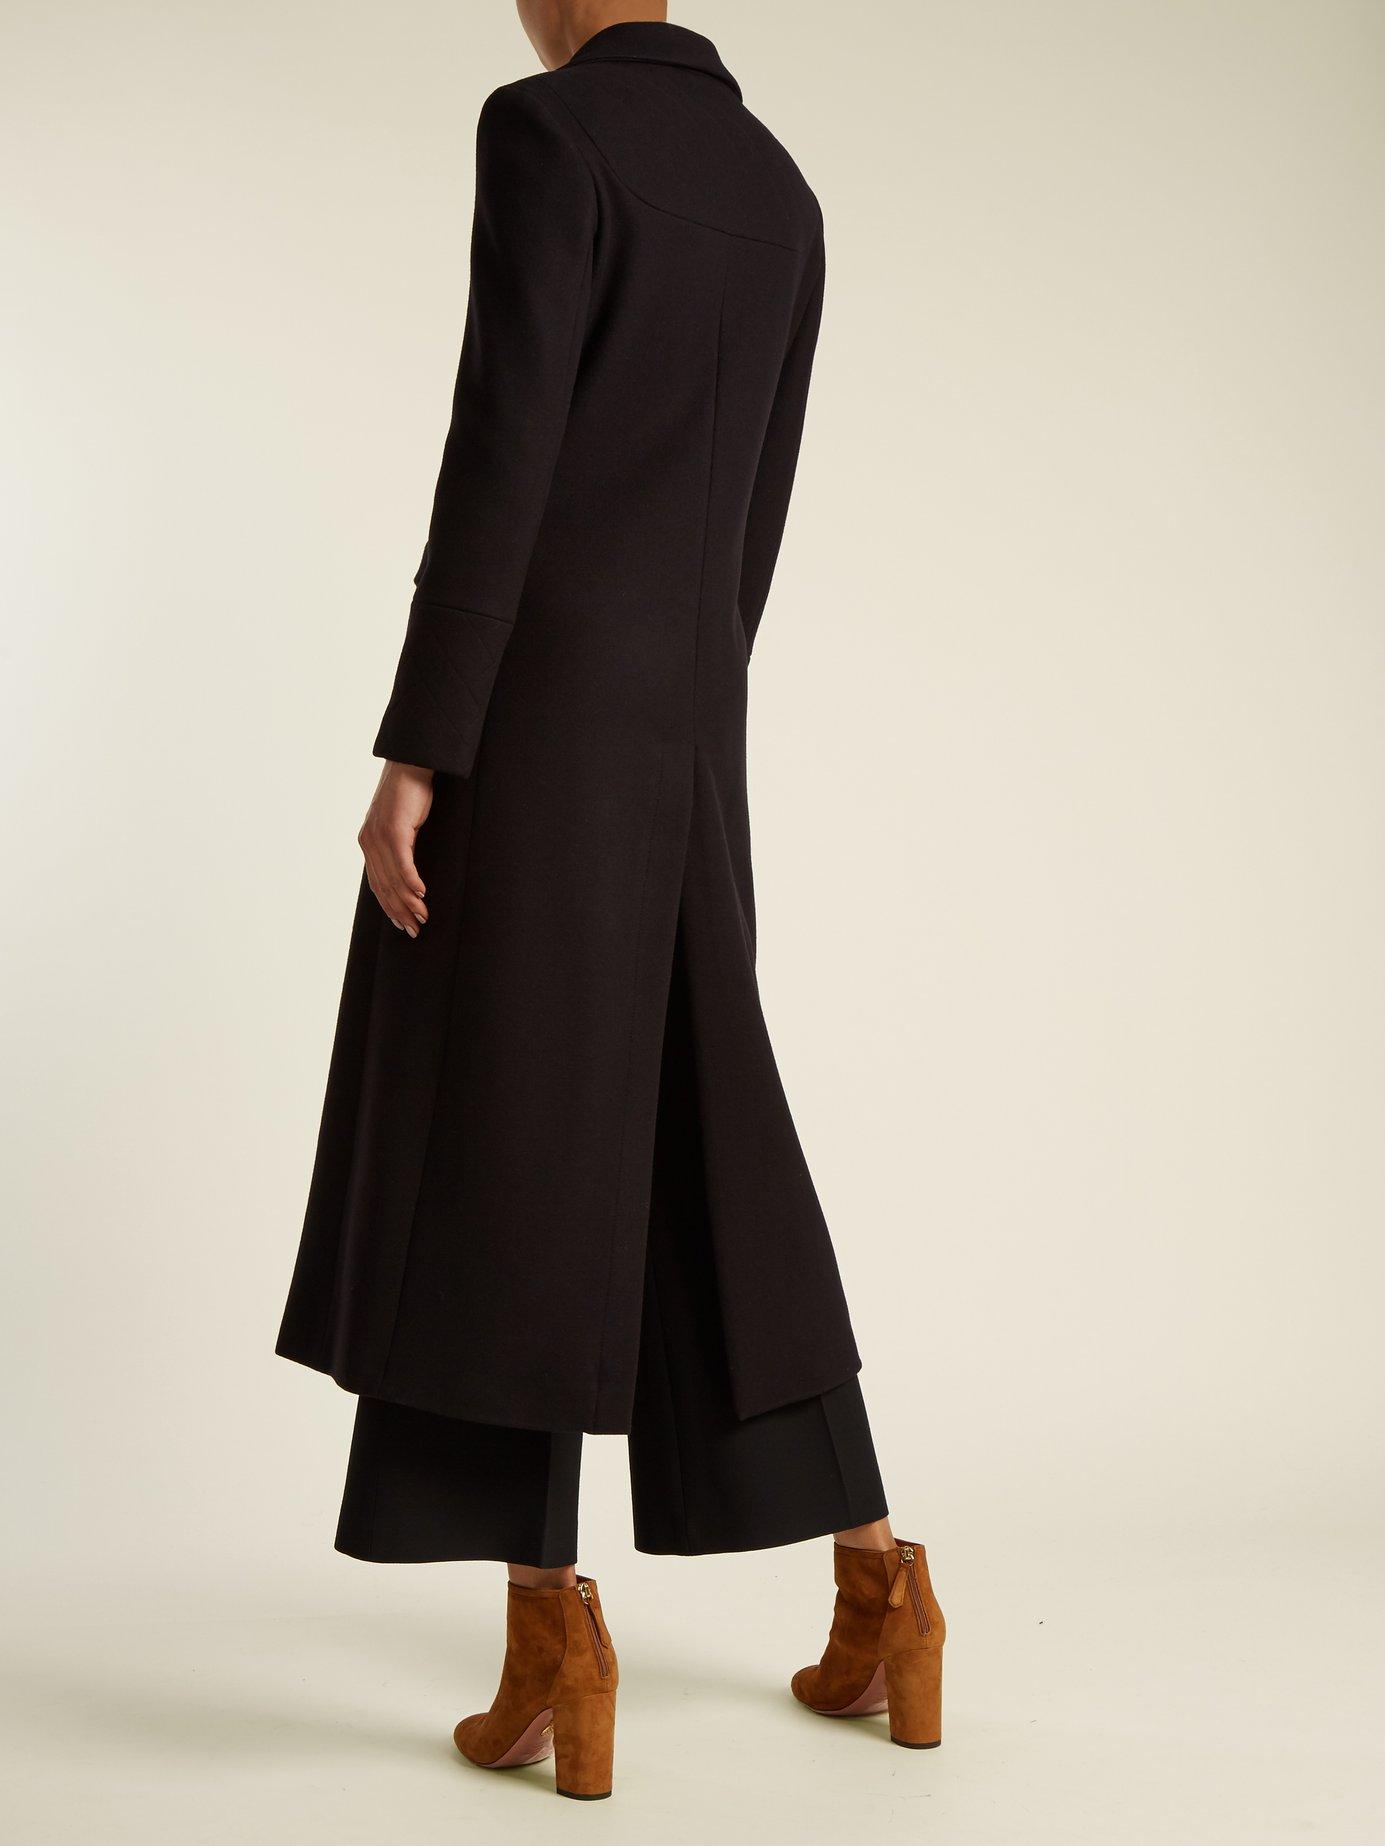 Delauney single-breasted wool-blend coat by Osman